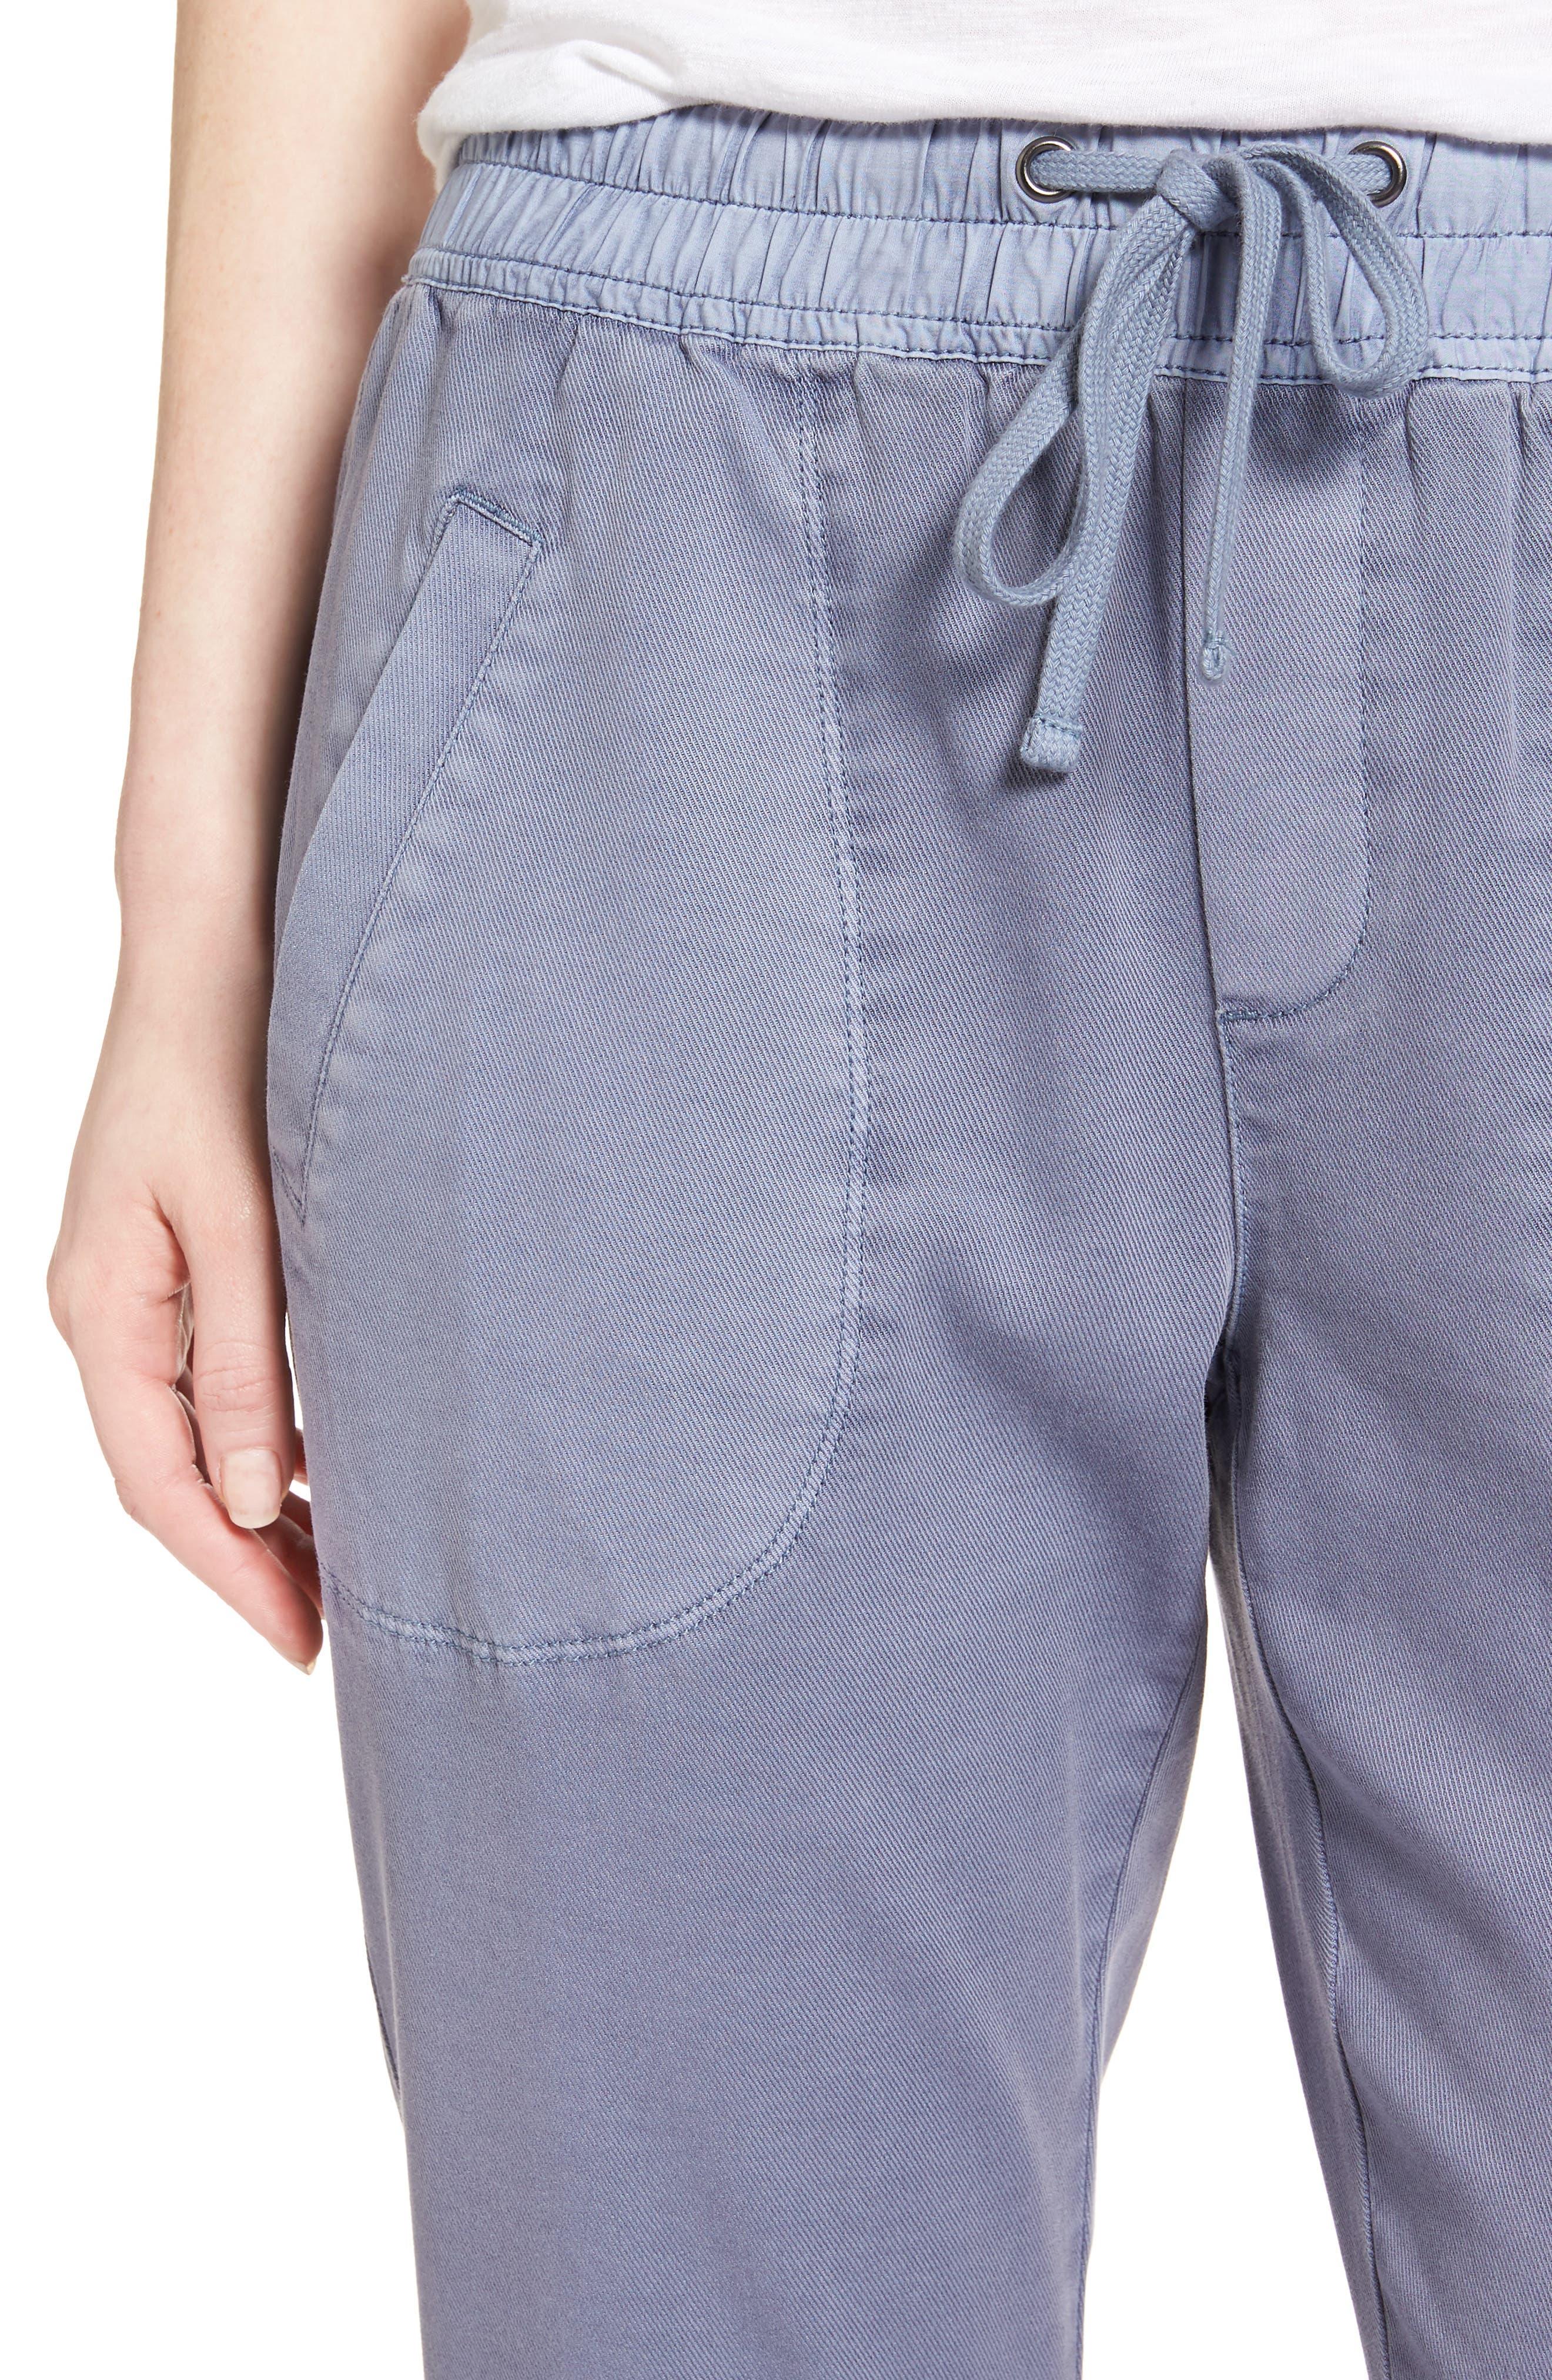 Modern Utility Pants,                             Alternate thumbnail 4, color,                             Indigo Wash